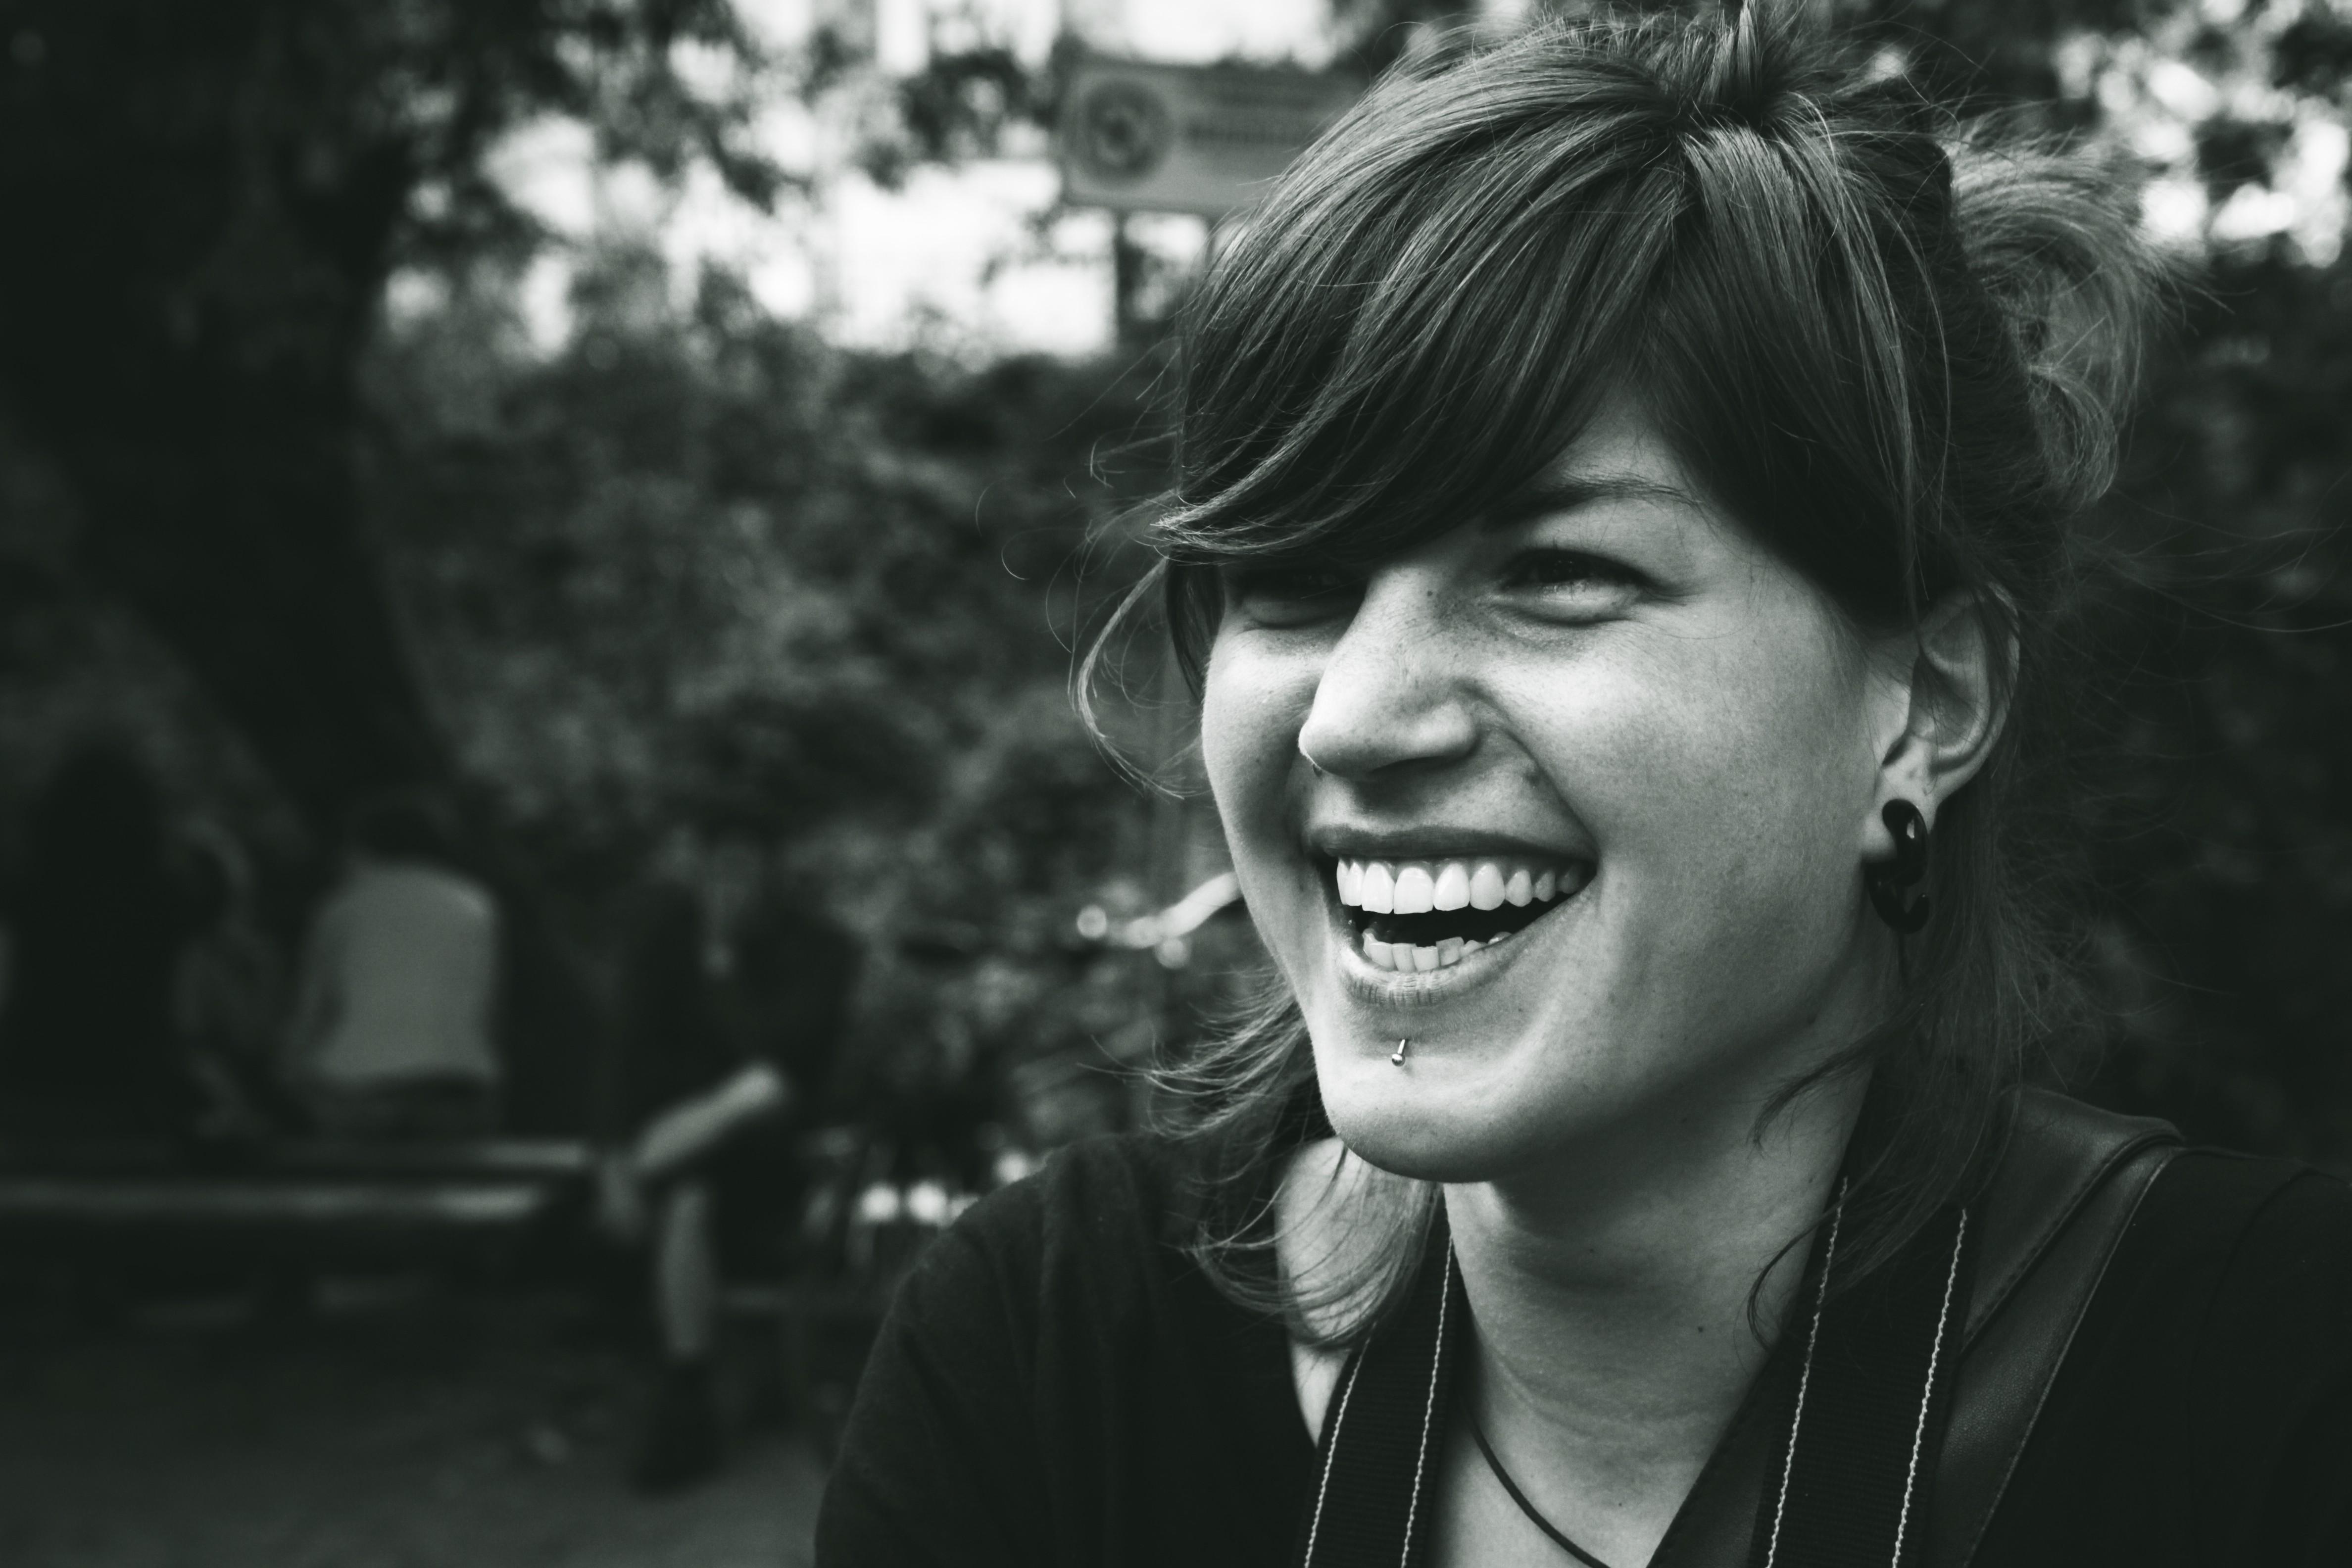 Psicóloga descobre por que choramos de alegria